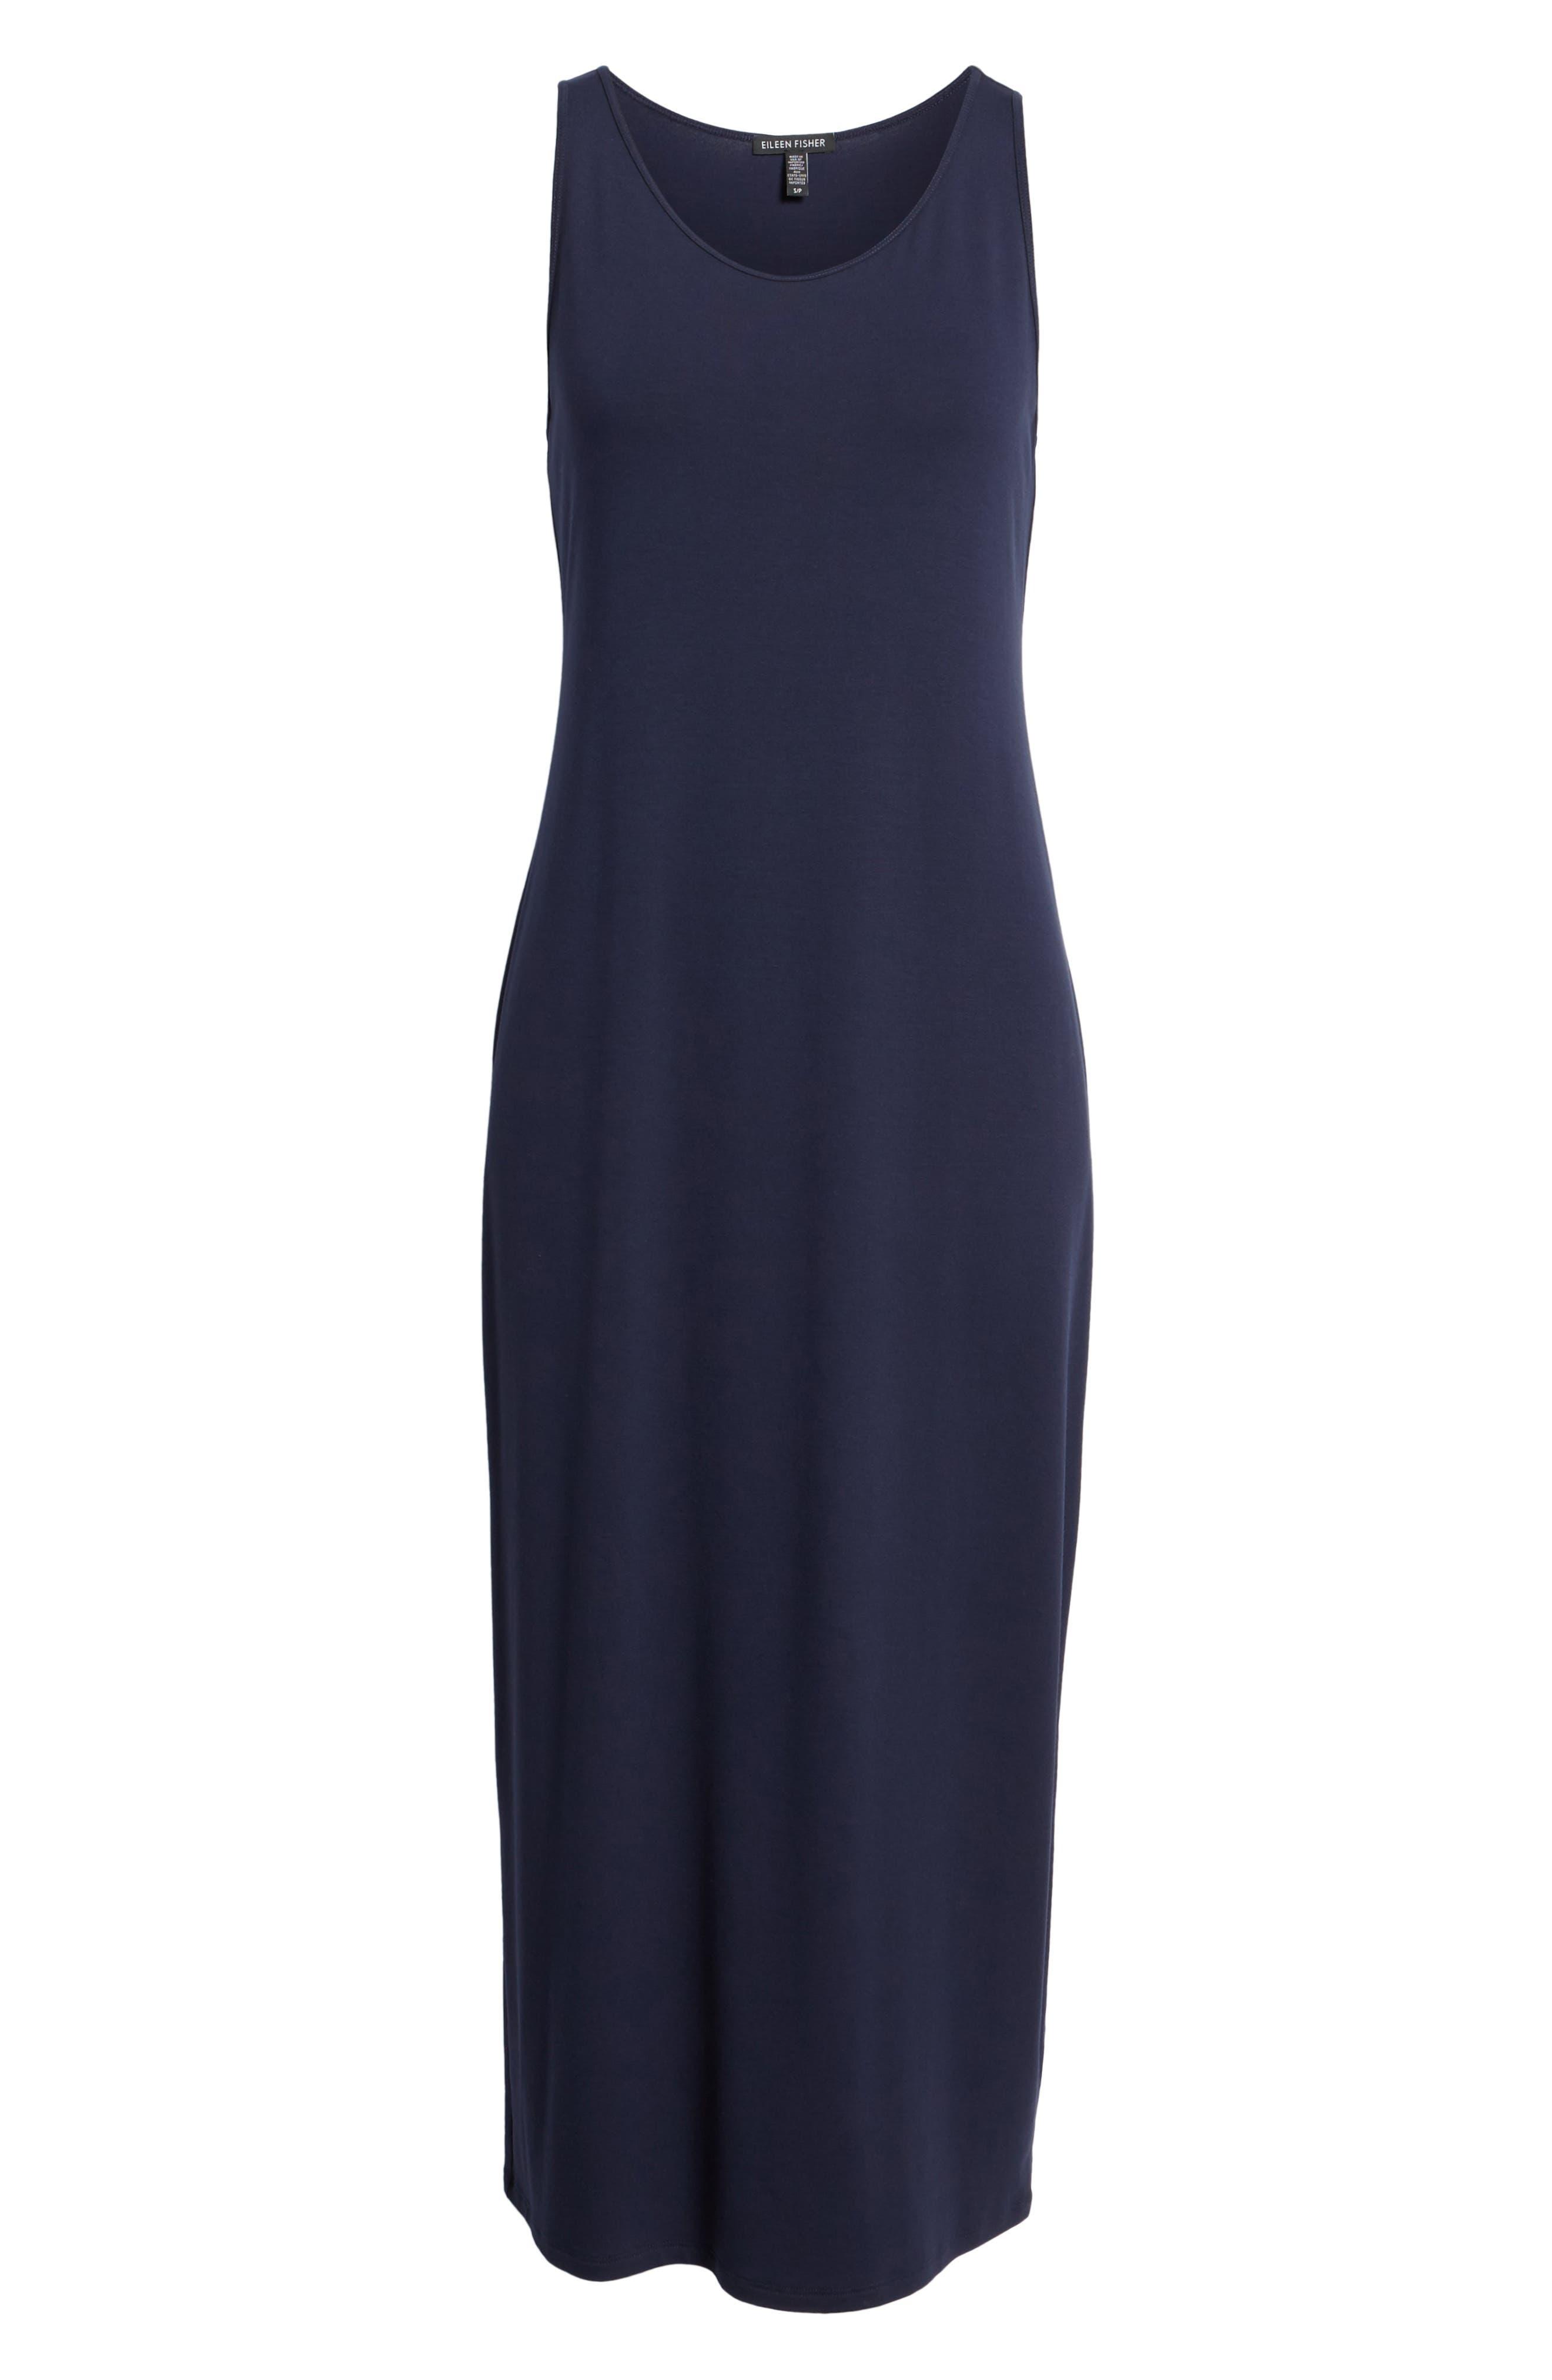 Midi Tank Dress,                             Alternate thumbnail 7, color,                             MIDNIGHT